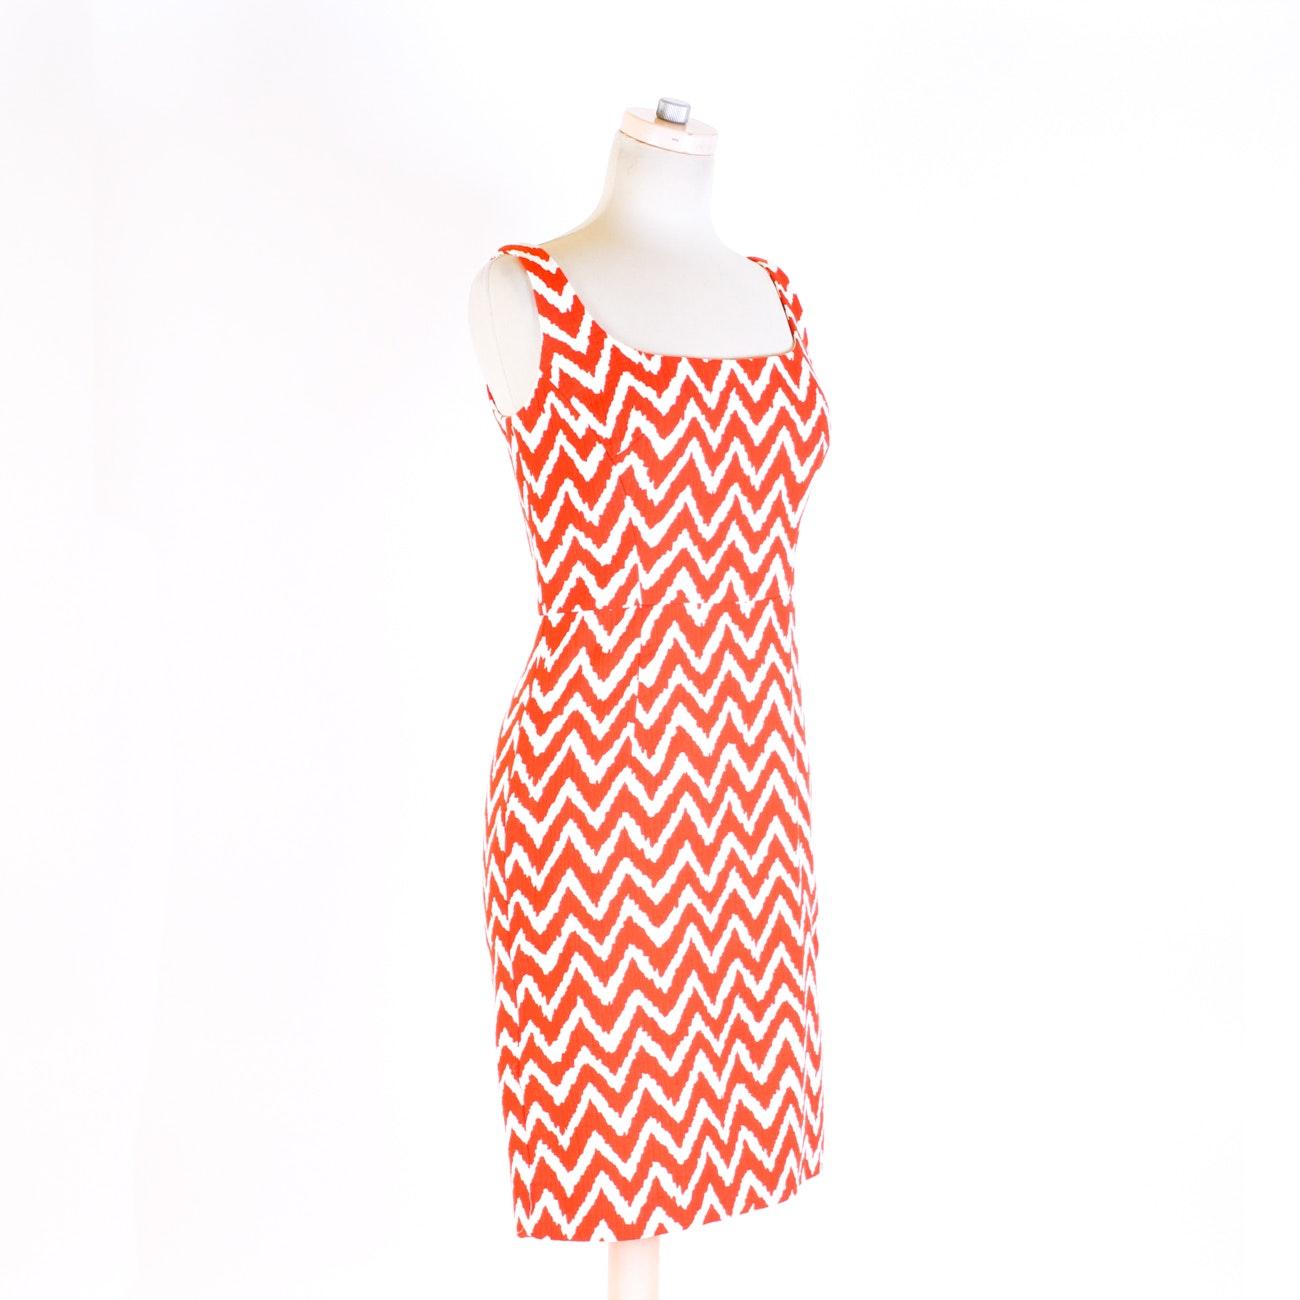 Original Milly of New York Sleeveless Chevron Print Dress